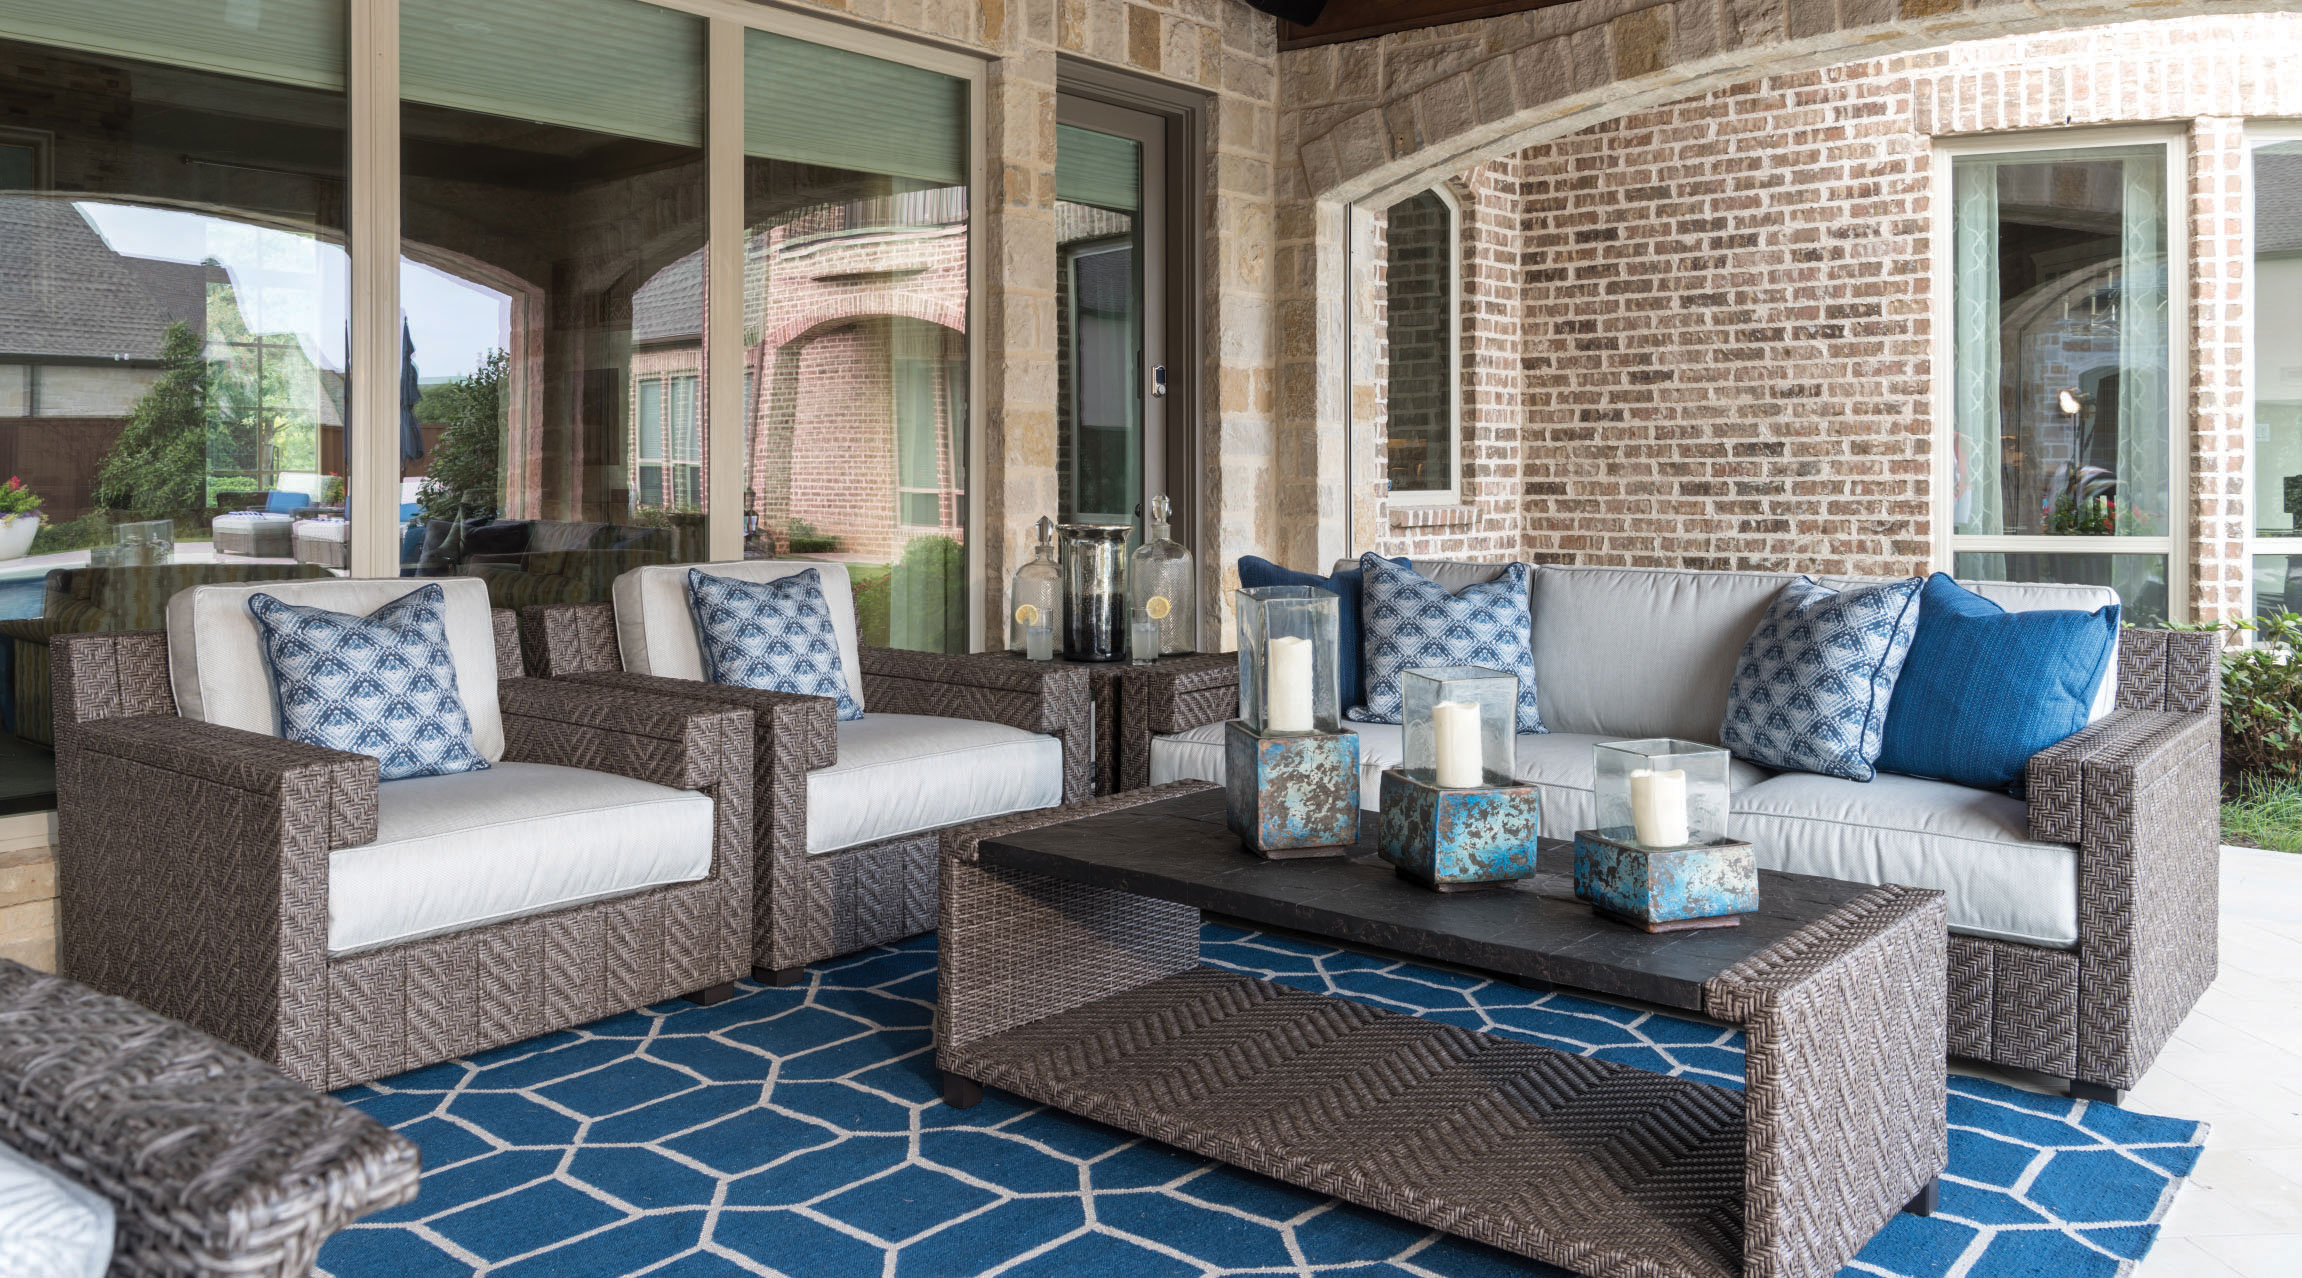 From Dream To Reality 1 - Dallas Interior Designer serving Plano, Frisco, Dallas, Allen for Decorating Den Interiors D'KOR HOME by Dee Frazier Interiors